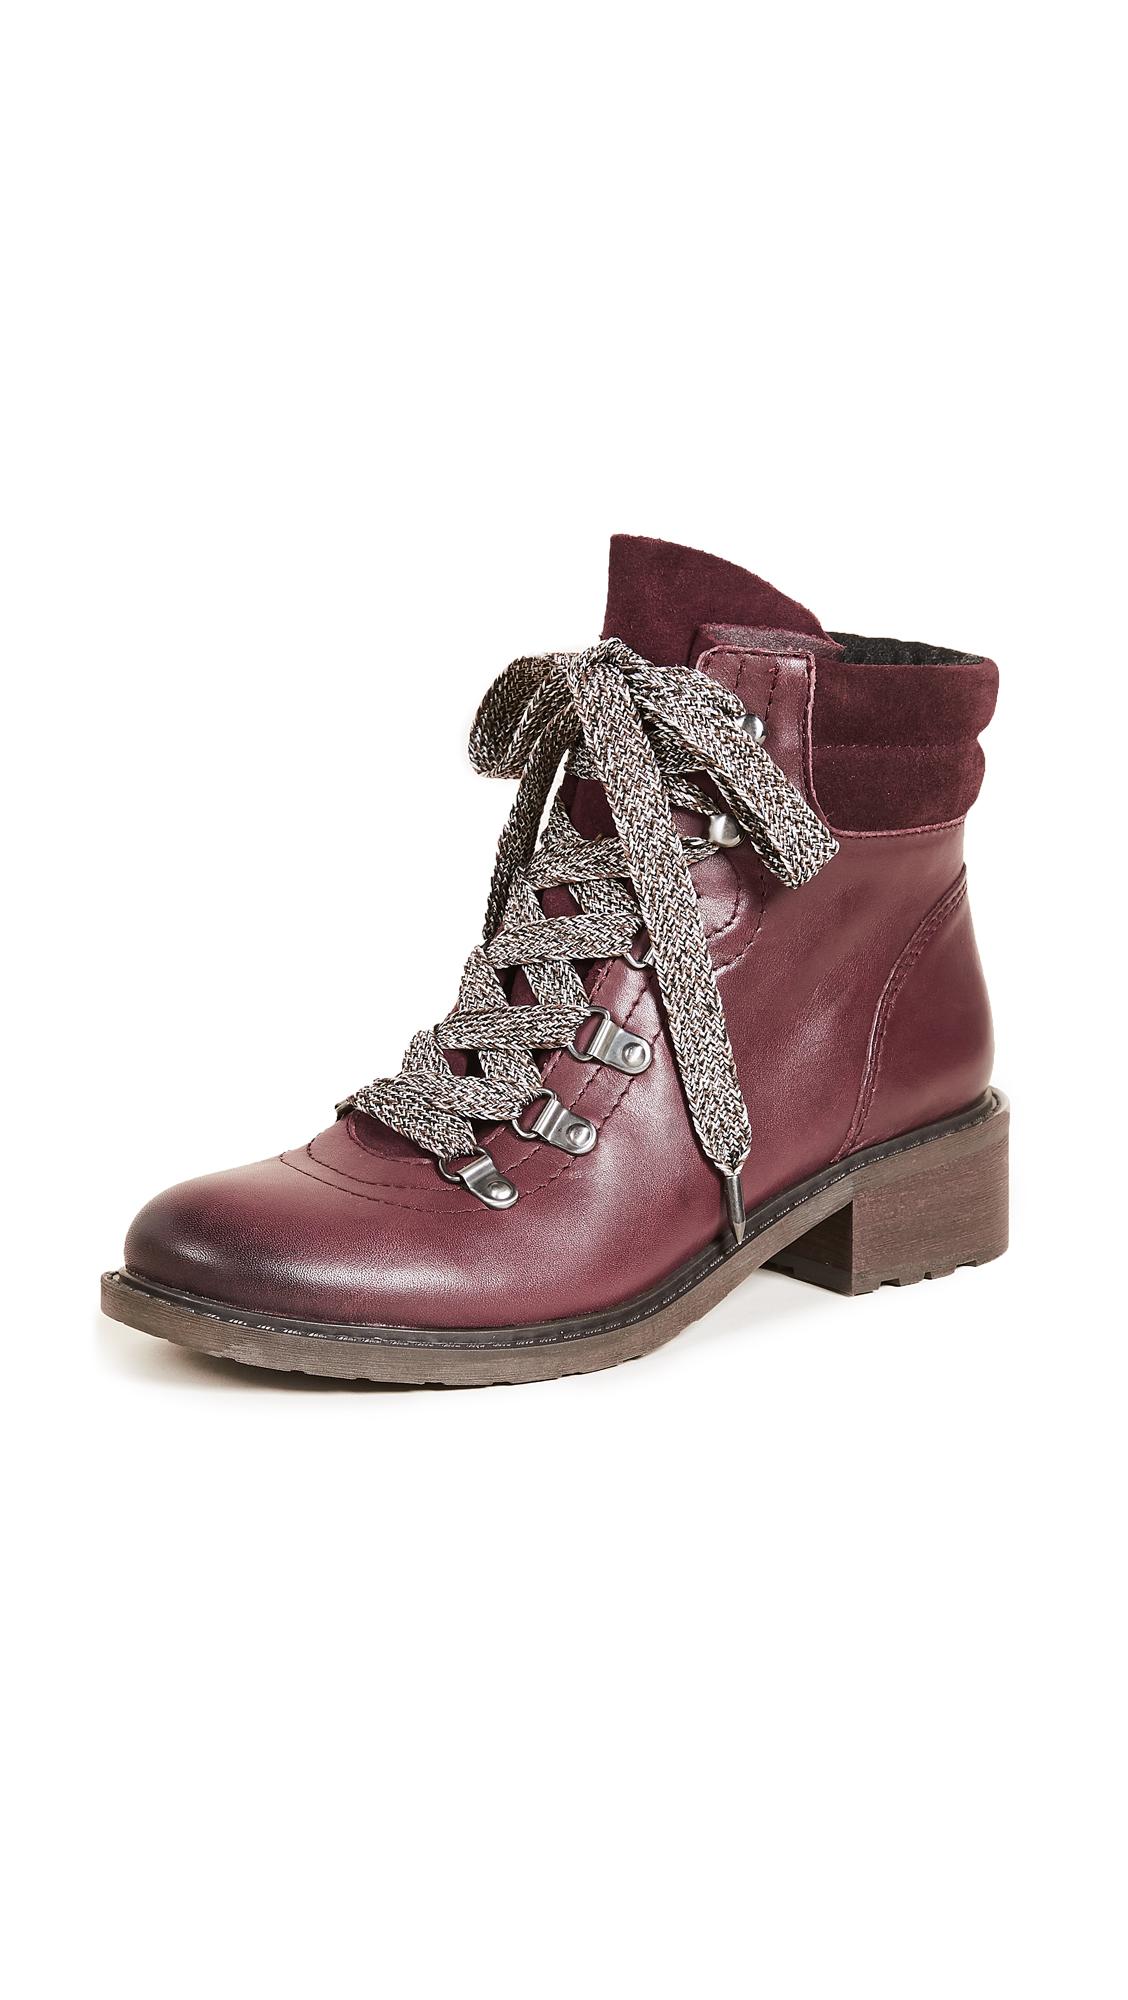 Sam Edelman Darrah Hiker Boots - Malbec